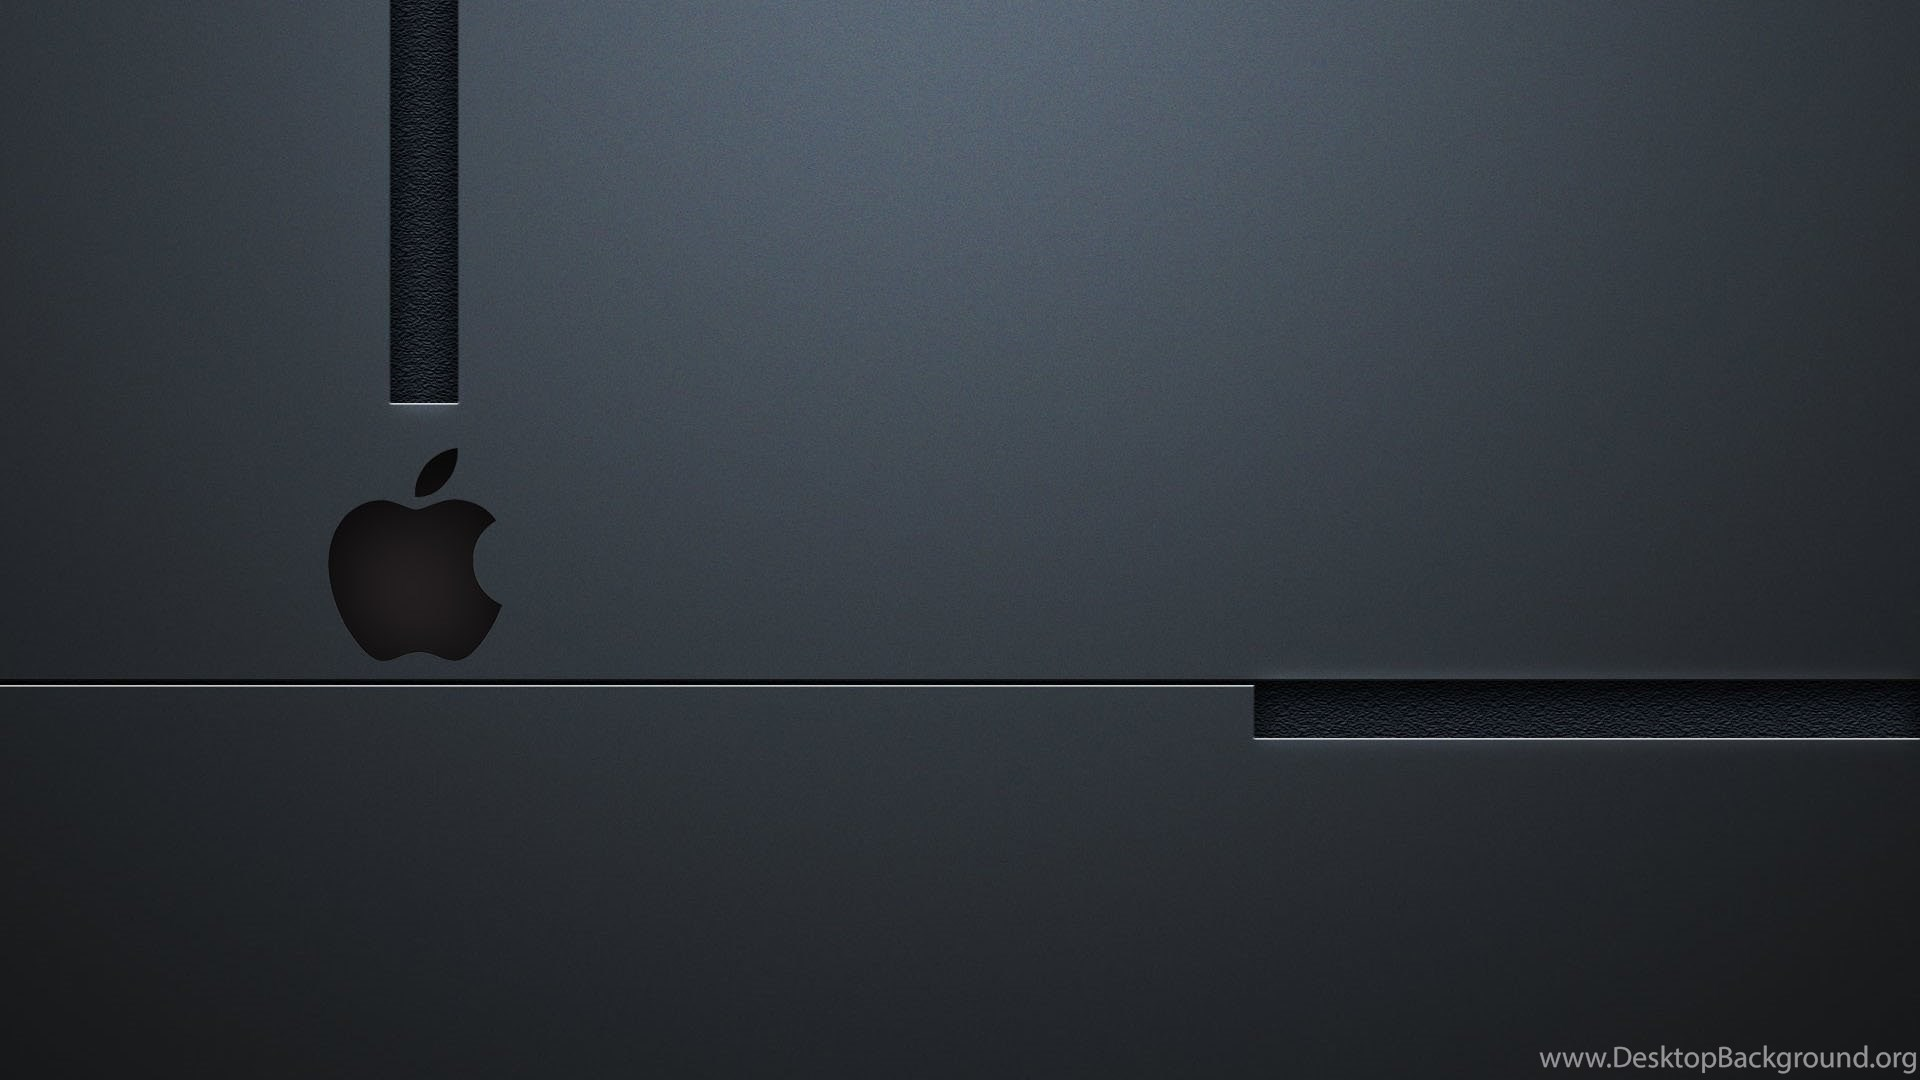 Mac HD Wallpaper Apple Wallpapers New Materials And